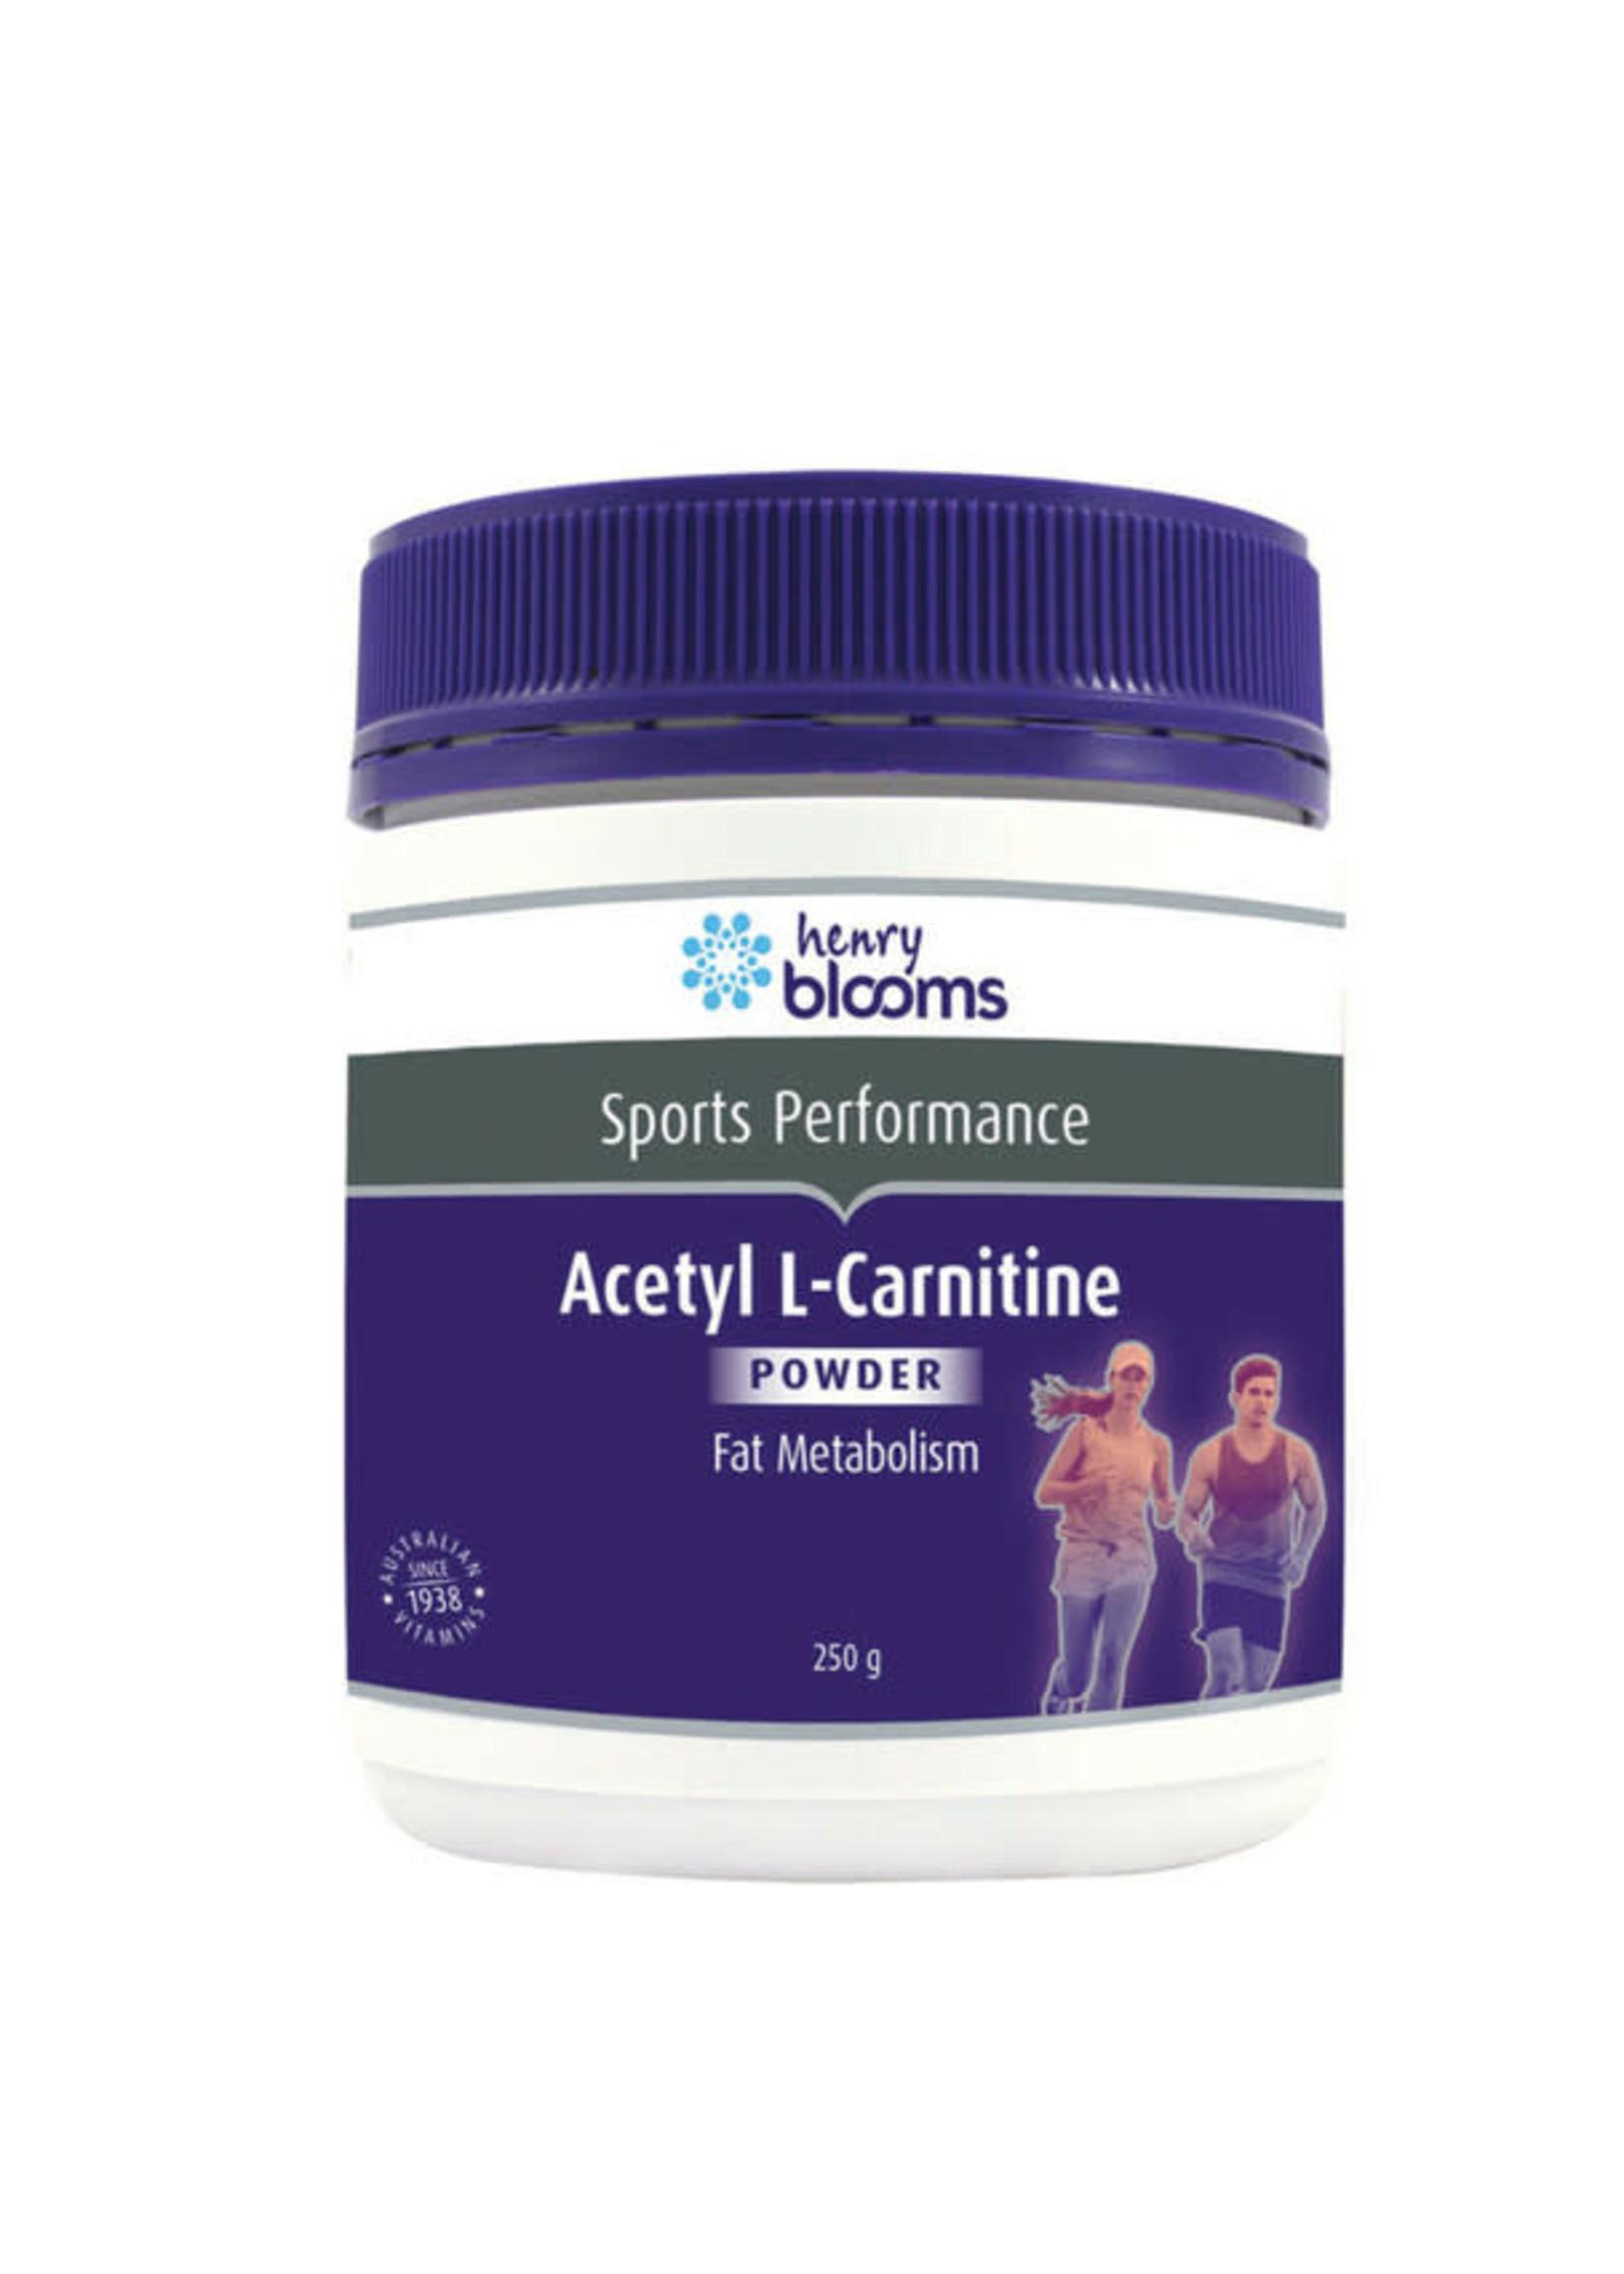 Blooms Acetyl L-Carnitine 250 g Powder